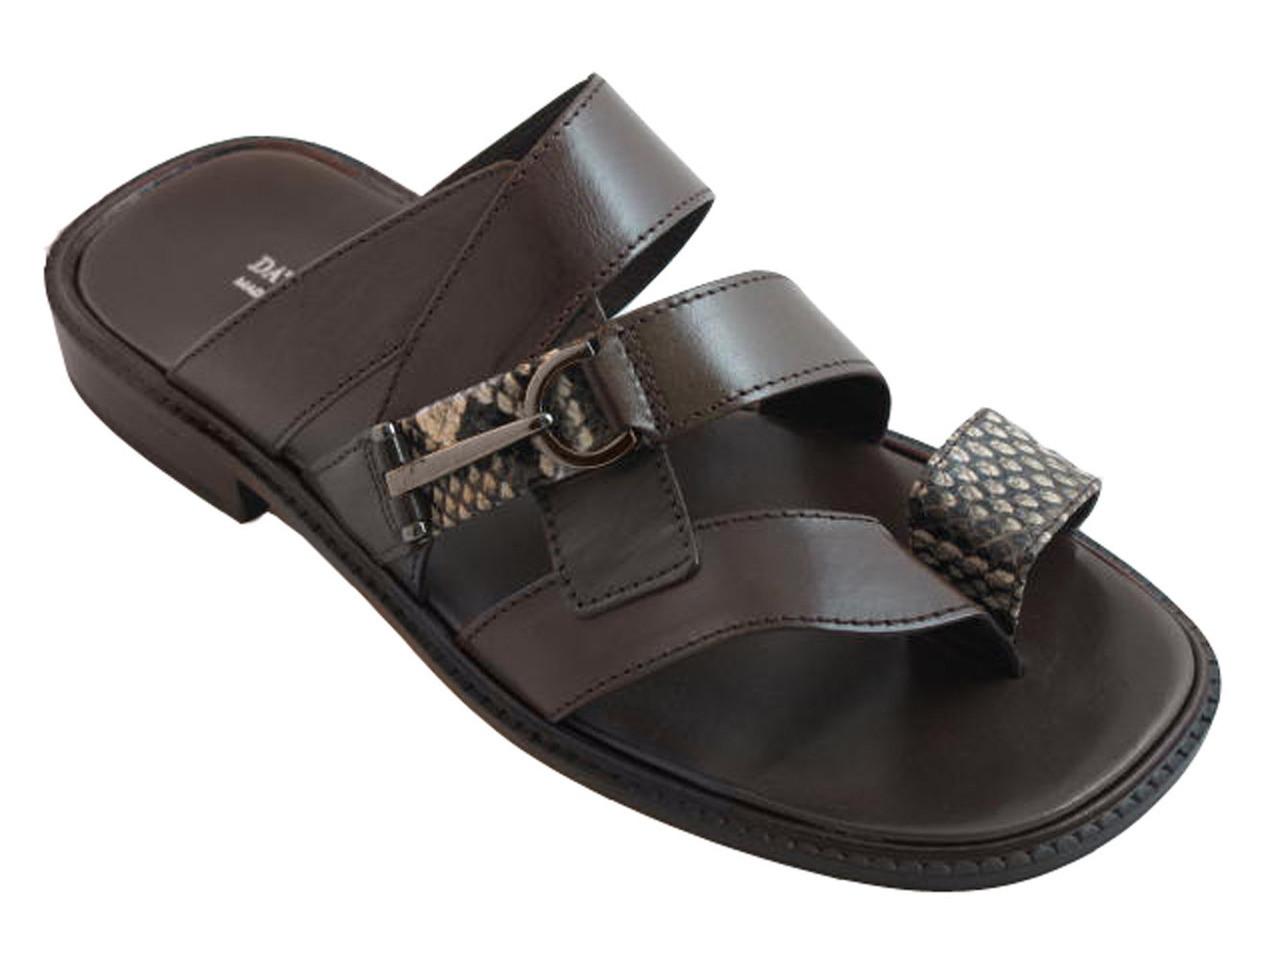 a8db9020d Davinci 2308 Men s Italian Ring Toe Python Sandals.  229.00. 2308 Brown